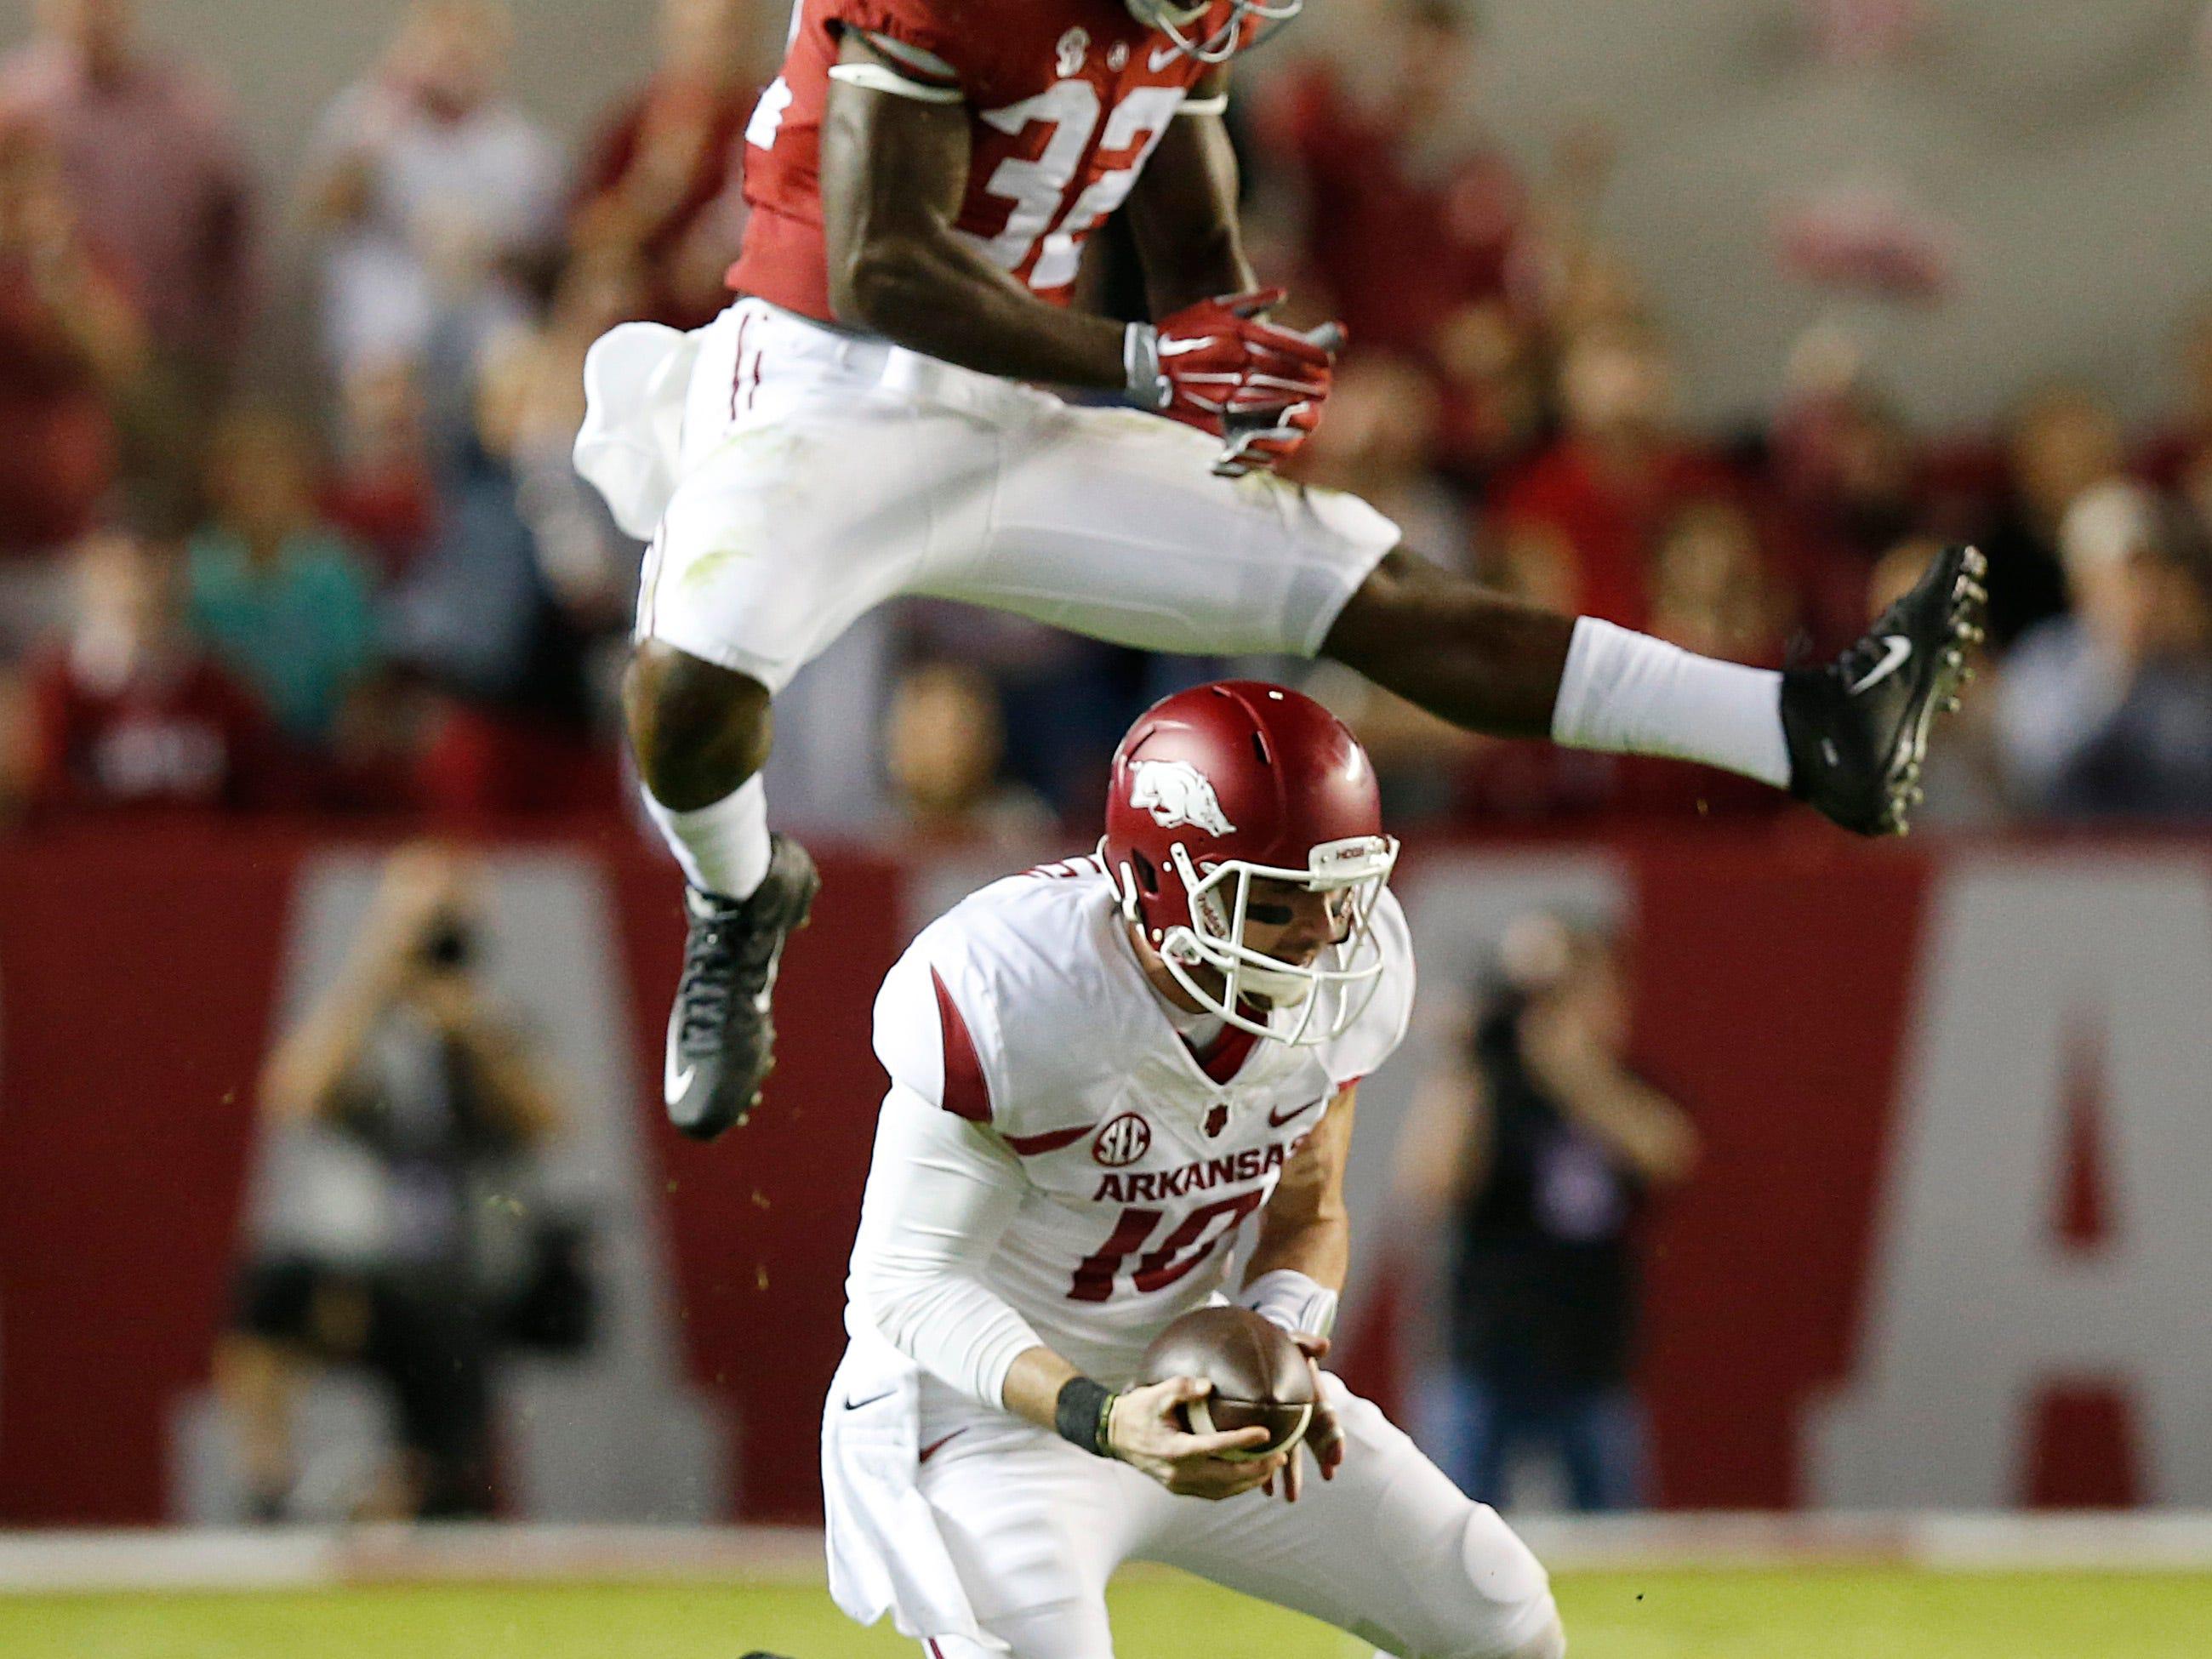 Alabama linebacker Rashaan Evans (32) jumps over Arkansas quarterback Brandon Allen (10) in the first half of an NCAA college football game, Saturday, Oct. 10, 2015, in Tuscaloosa, Ala. (AP Photo/Brynn Anderson)